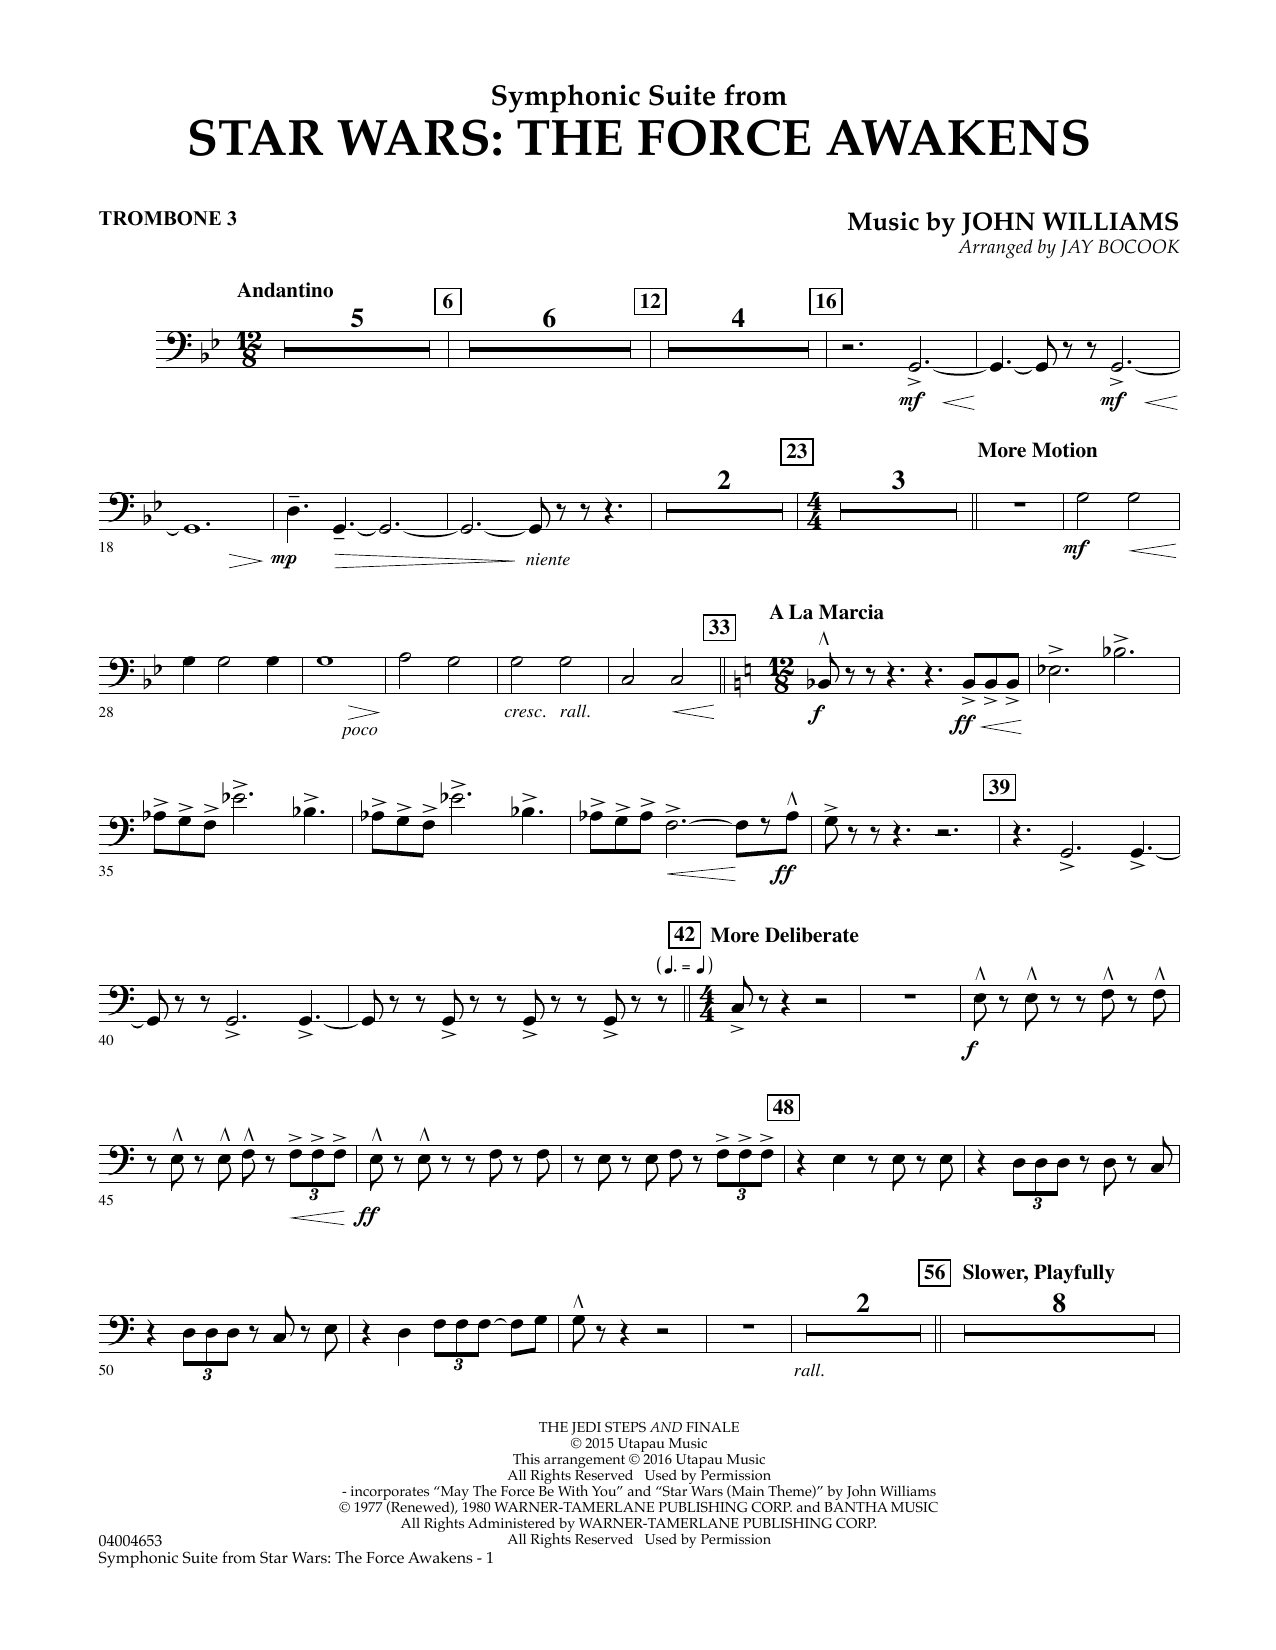 John Williams - Symphonic Suite from Star Wars: The Force Awakens - Trombone 3